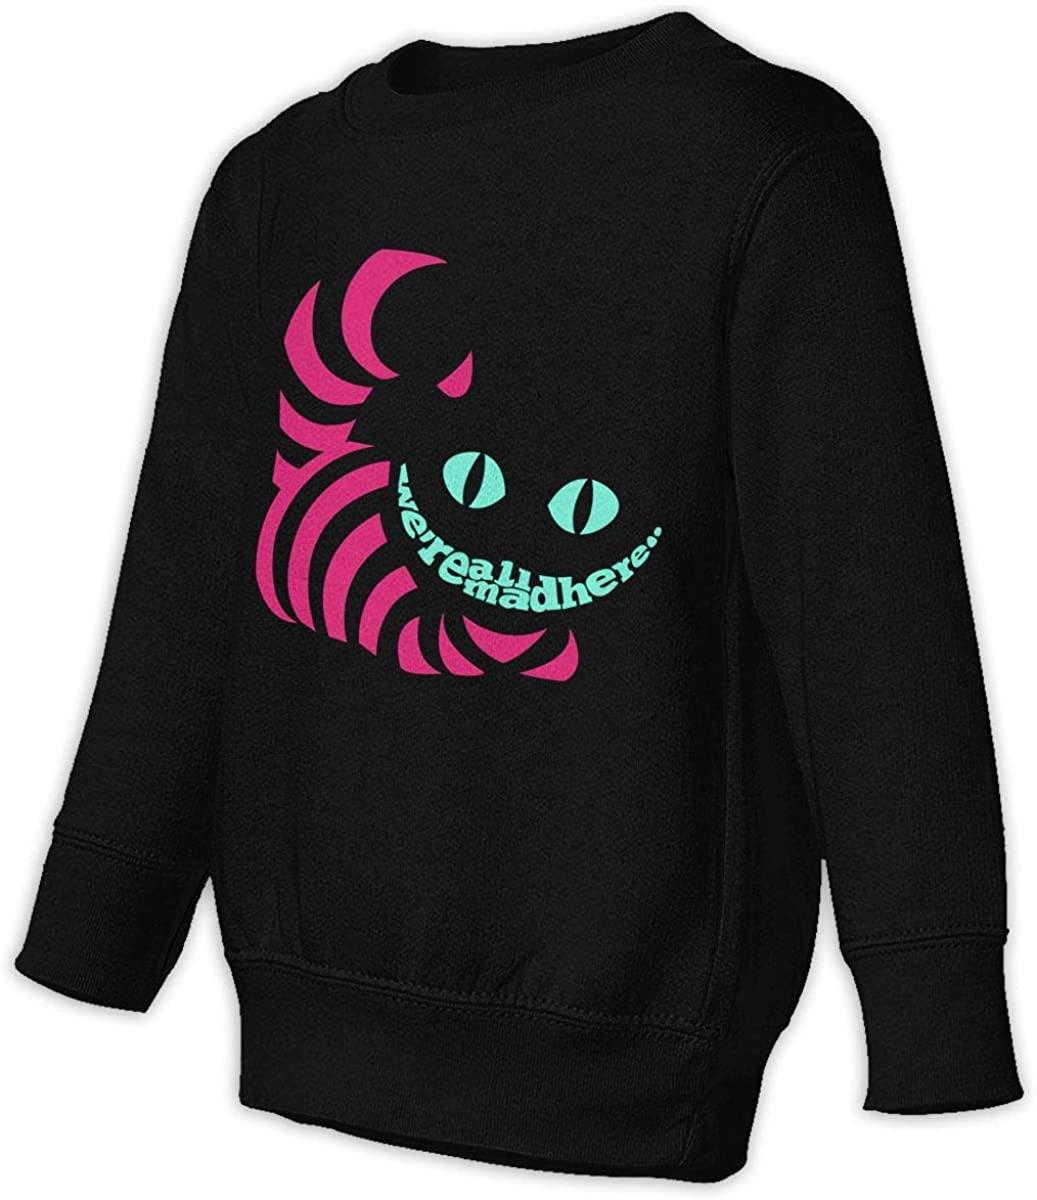 Alice in Wonderland Cheshire Cat Unisex Sweatshirt Youth Boy and Girls Pullover Sweatshirt Black